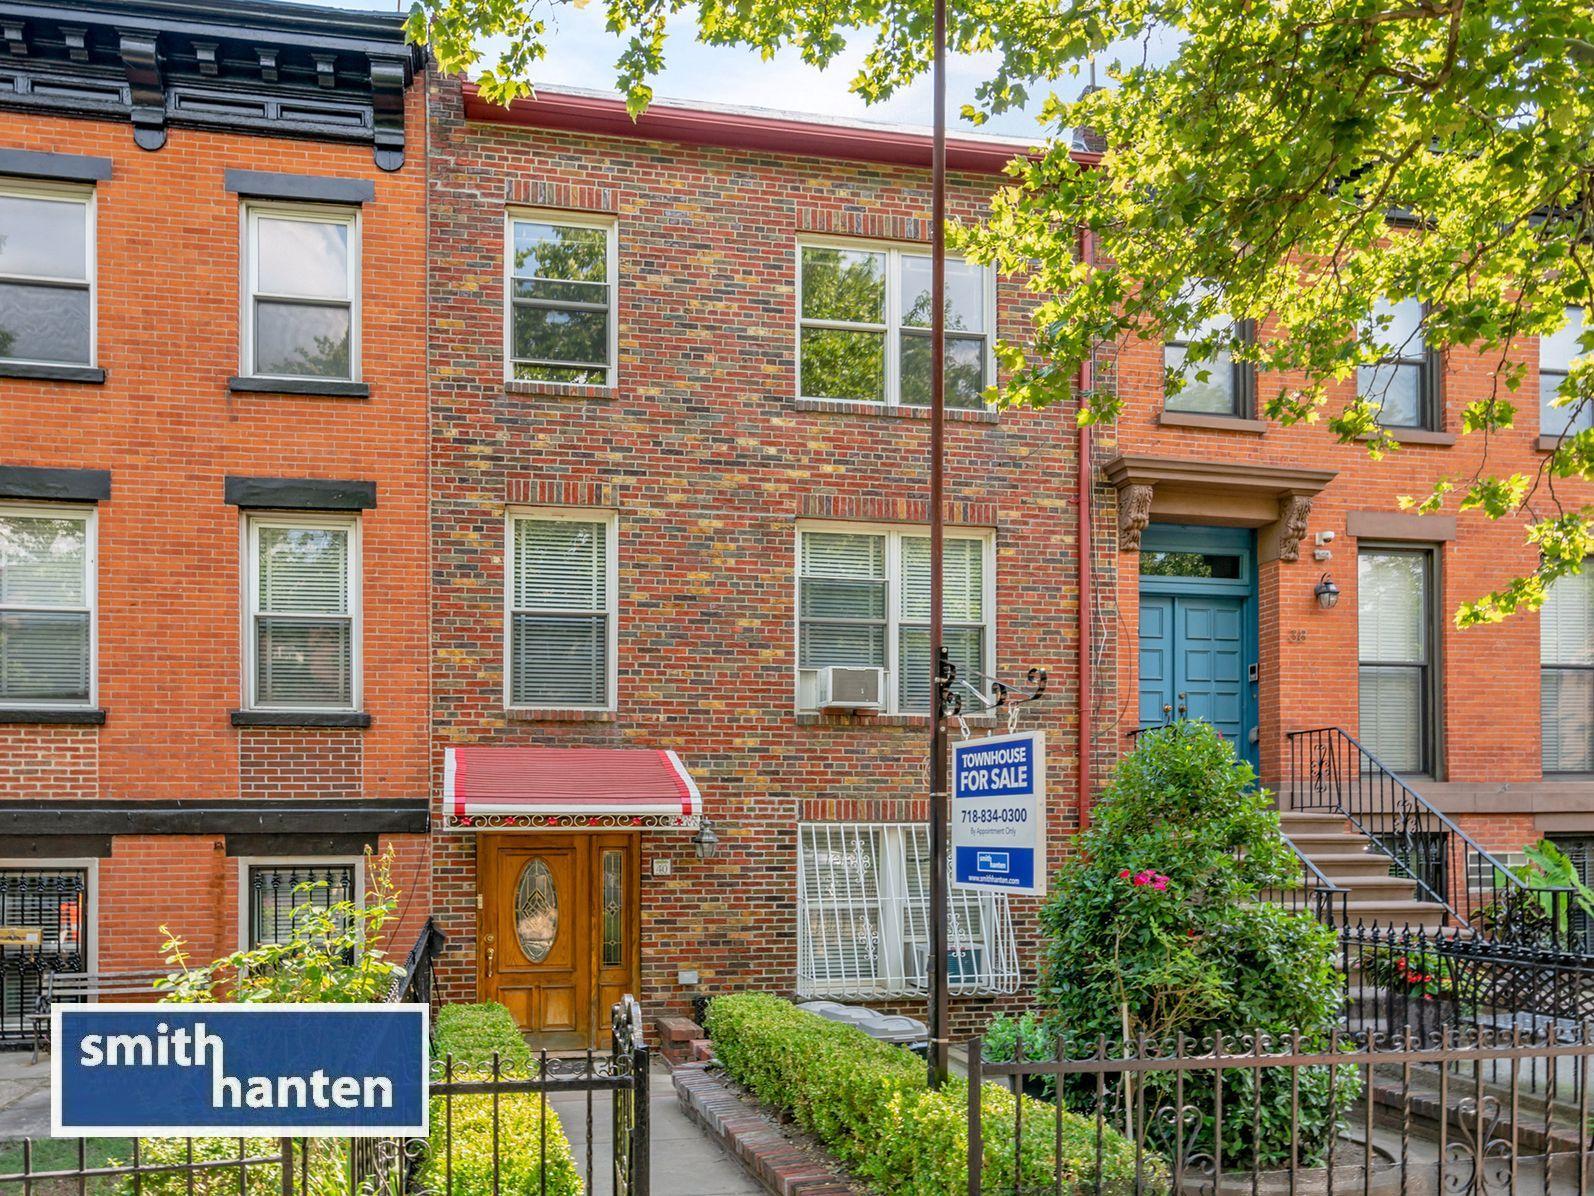 40 2nd Street for sale - Carroll Gardens 11231 - Smith Hanten ...